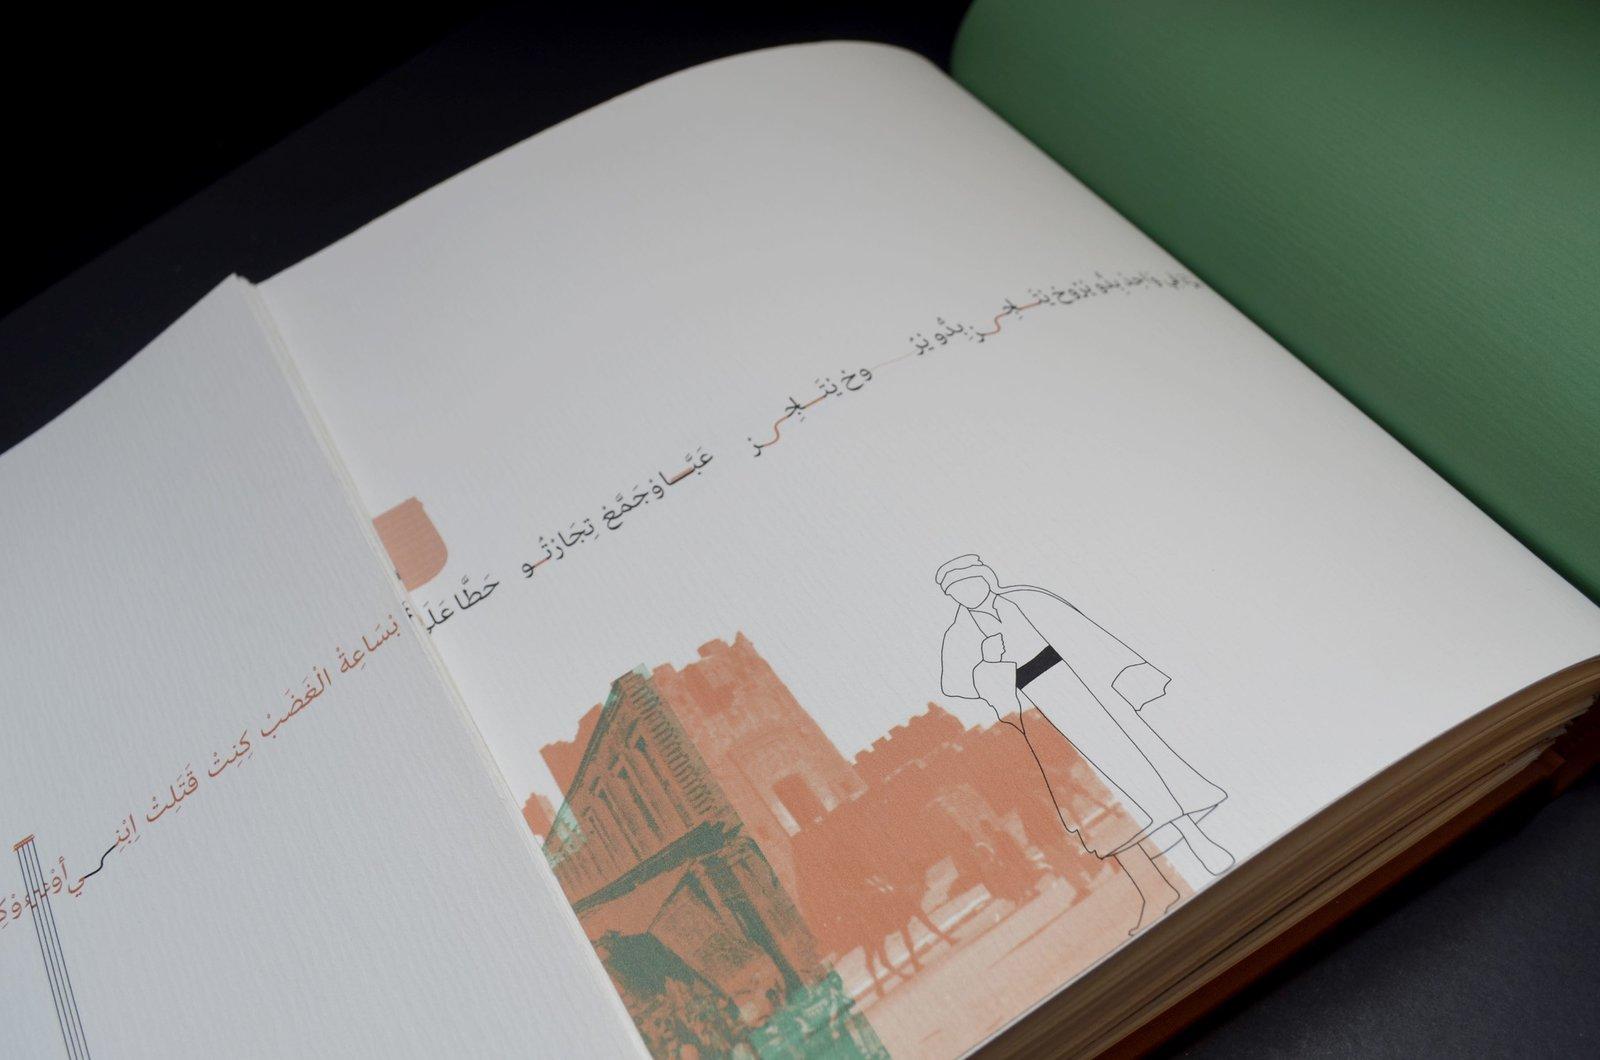 b menzione d'nore categoria studentesse Ranim Alhalaky 50 Meters of mayas stories AWDA 2017